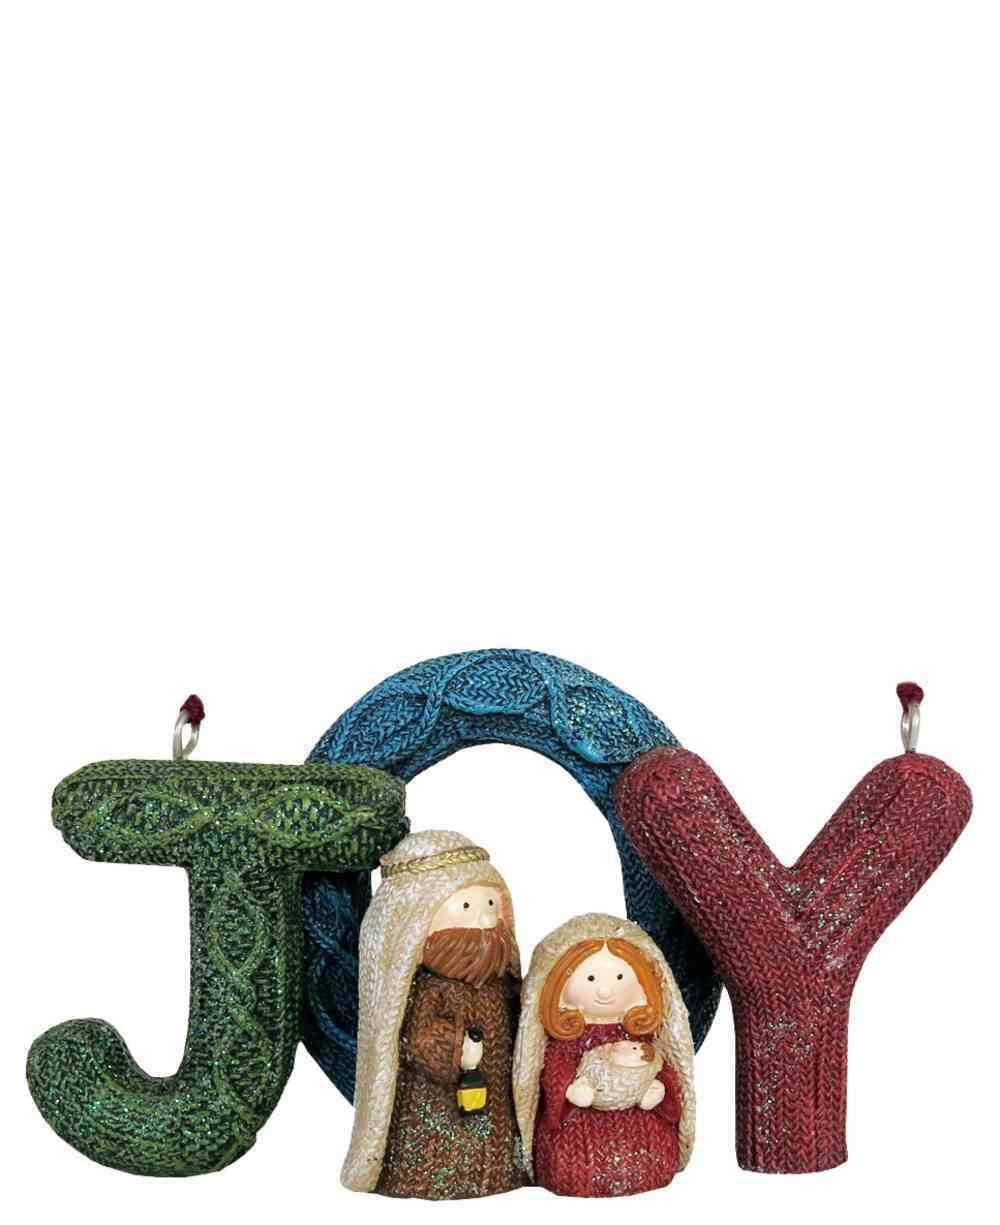 Resin Knitted Finish Holy Family Tree Ornament: Joy, Coloured Homeware